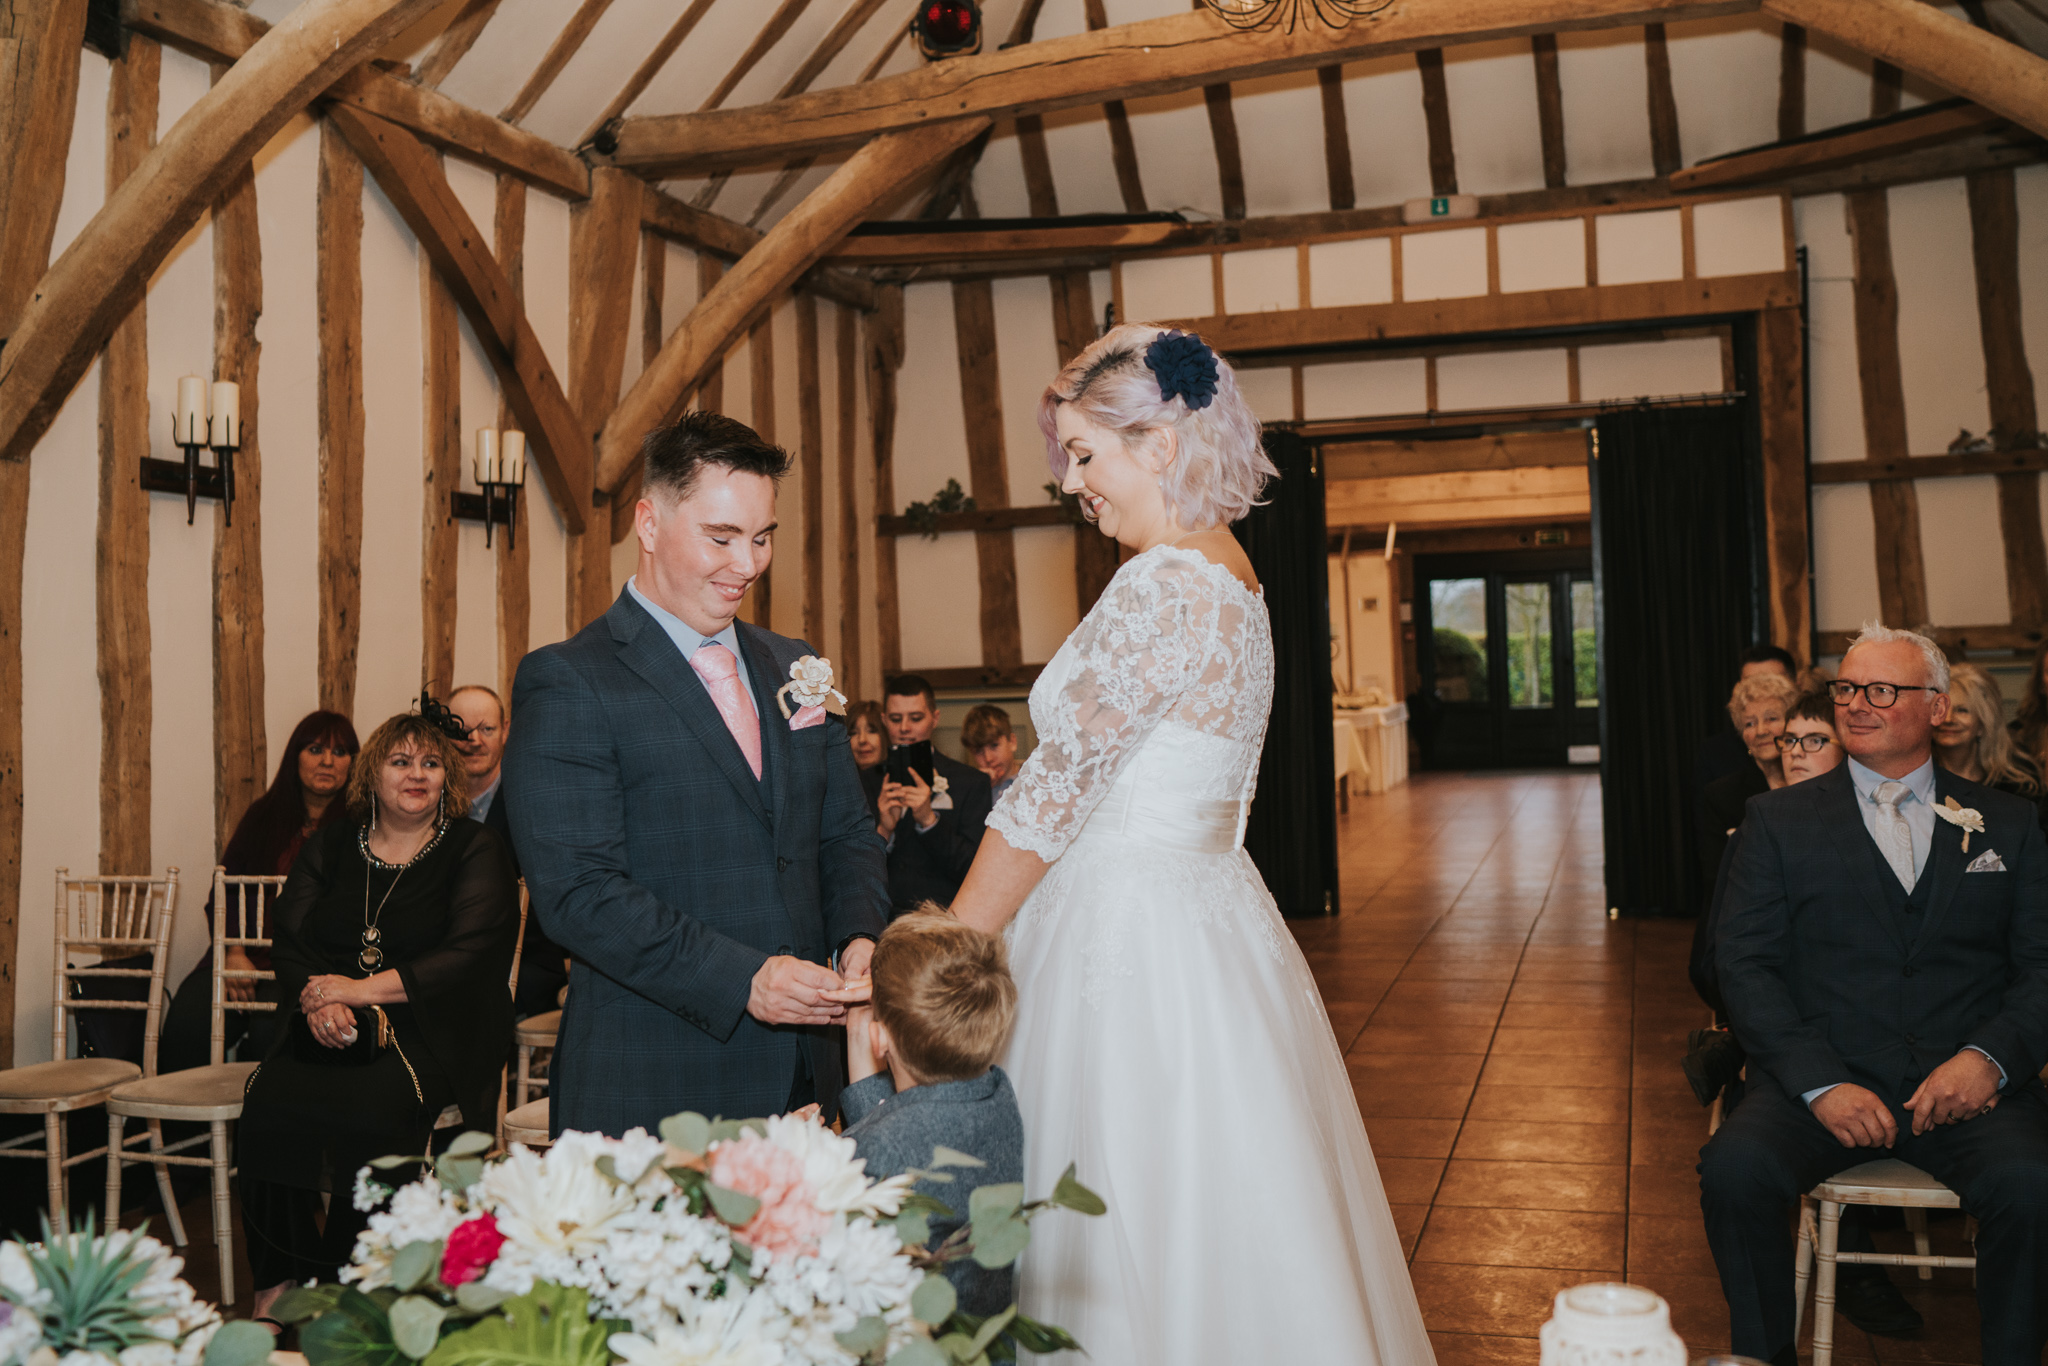 rhia-james-rustic-crabbs-barn-vintage-50s-retro-wedding-grace-elizabeth-colchester-essex-alternative-relaxed-wedding-family-photography-devon-suffolk-norfolk-essex (75 of 138).jpg